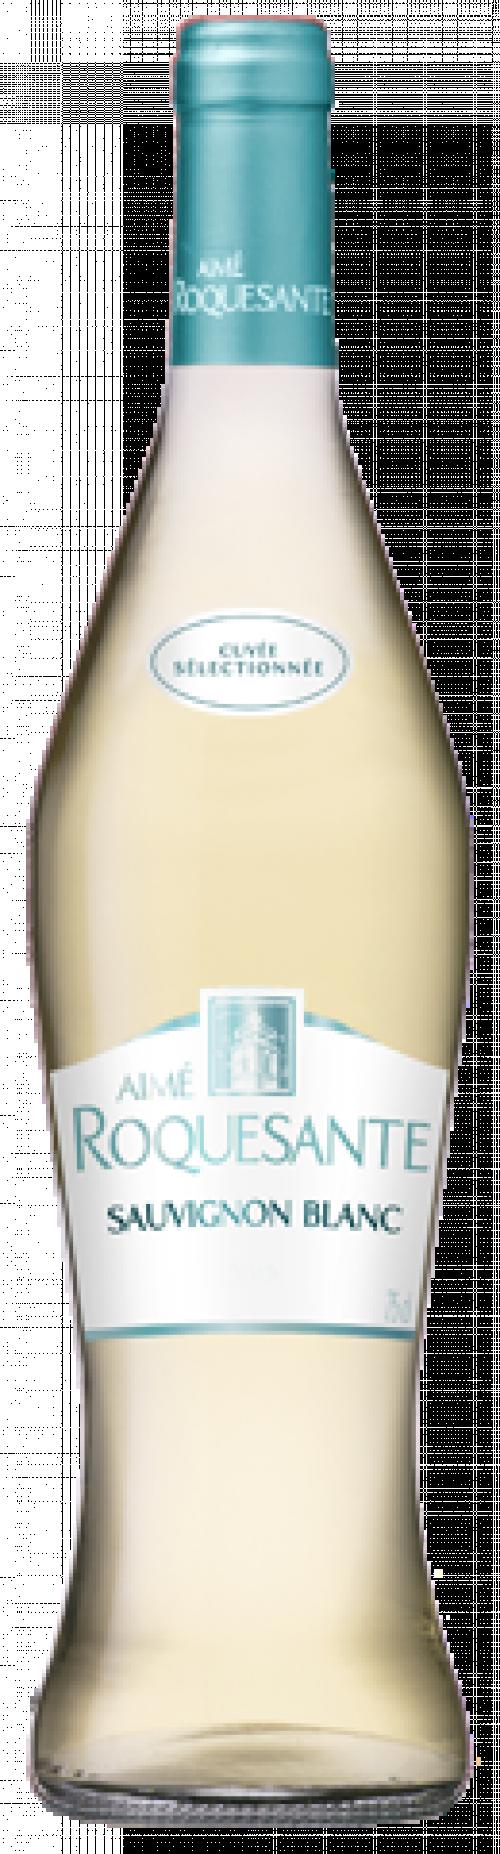 2019 Aime Roquesante Sauvignon Blanc 750ml